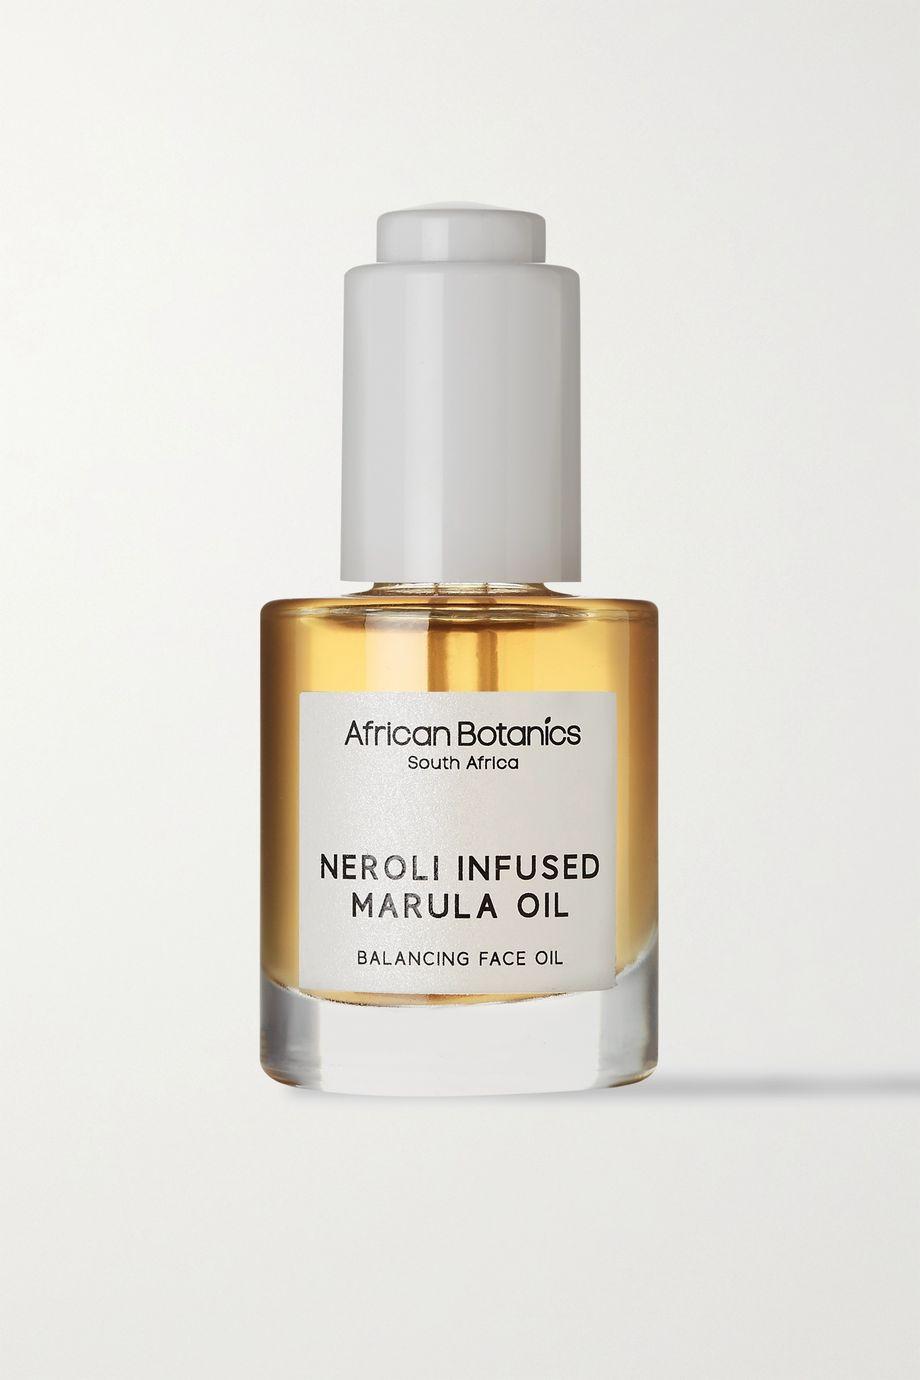 African Botanics + NET SUSTAIN Neroli Infused Marula Oil – Balancing Face Oil, 30 ml – Gesichtsöl